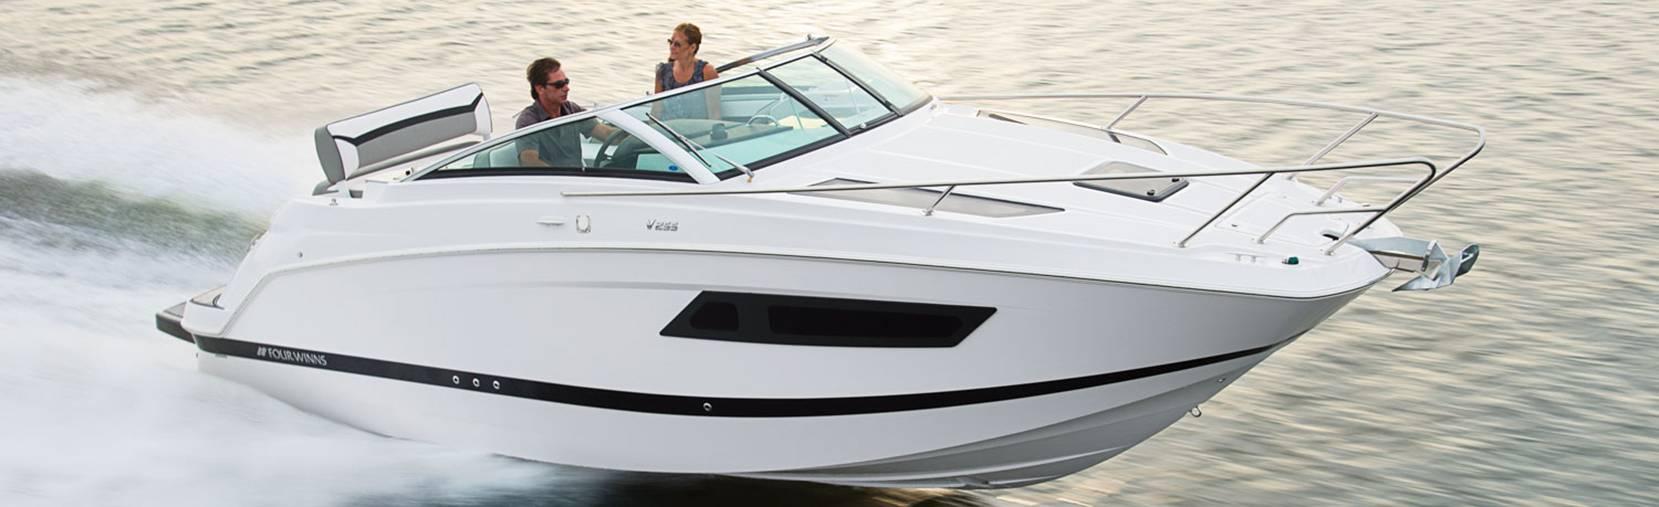 Four Winns Vista 255 boat